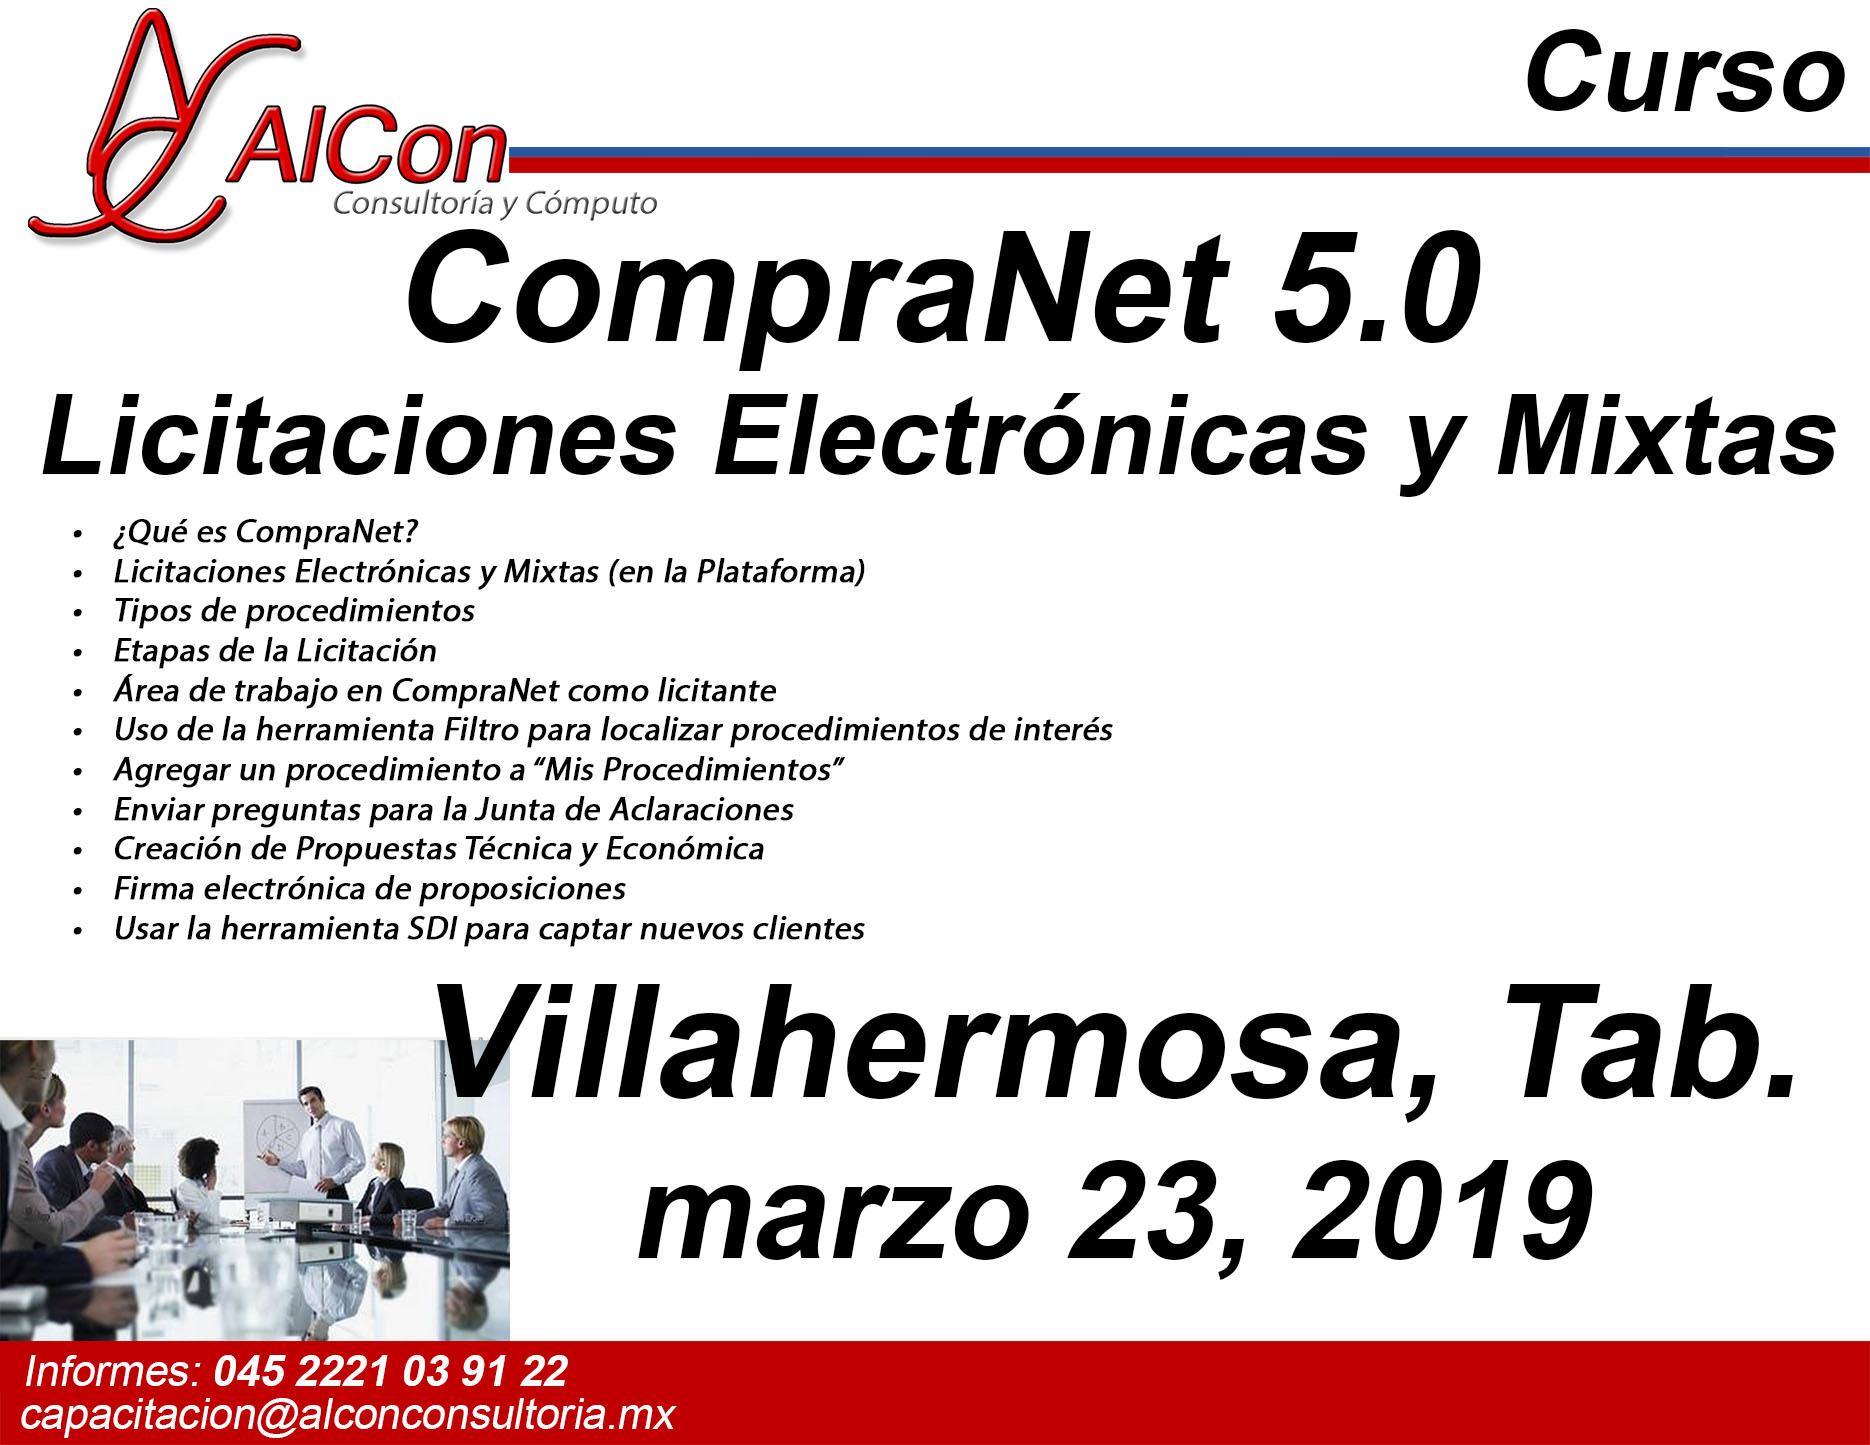 Curso CompraNet 5.0 Villahermosa, Tabasco